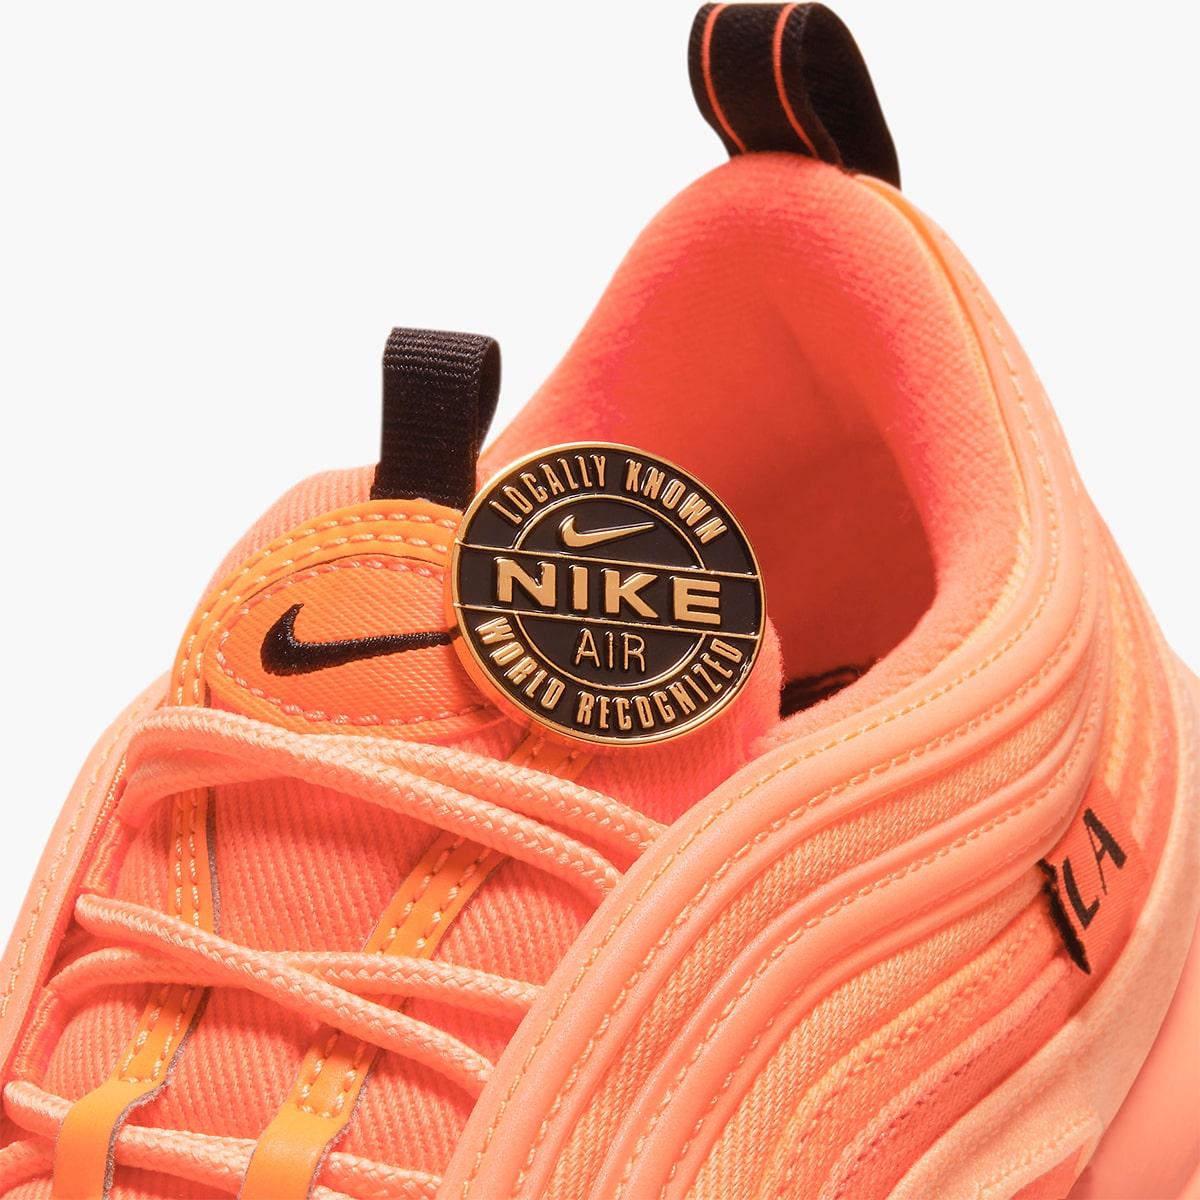 nike-air-max-97-los-angeles-orange-dh0144-800-dh0148-800-release-date-7